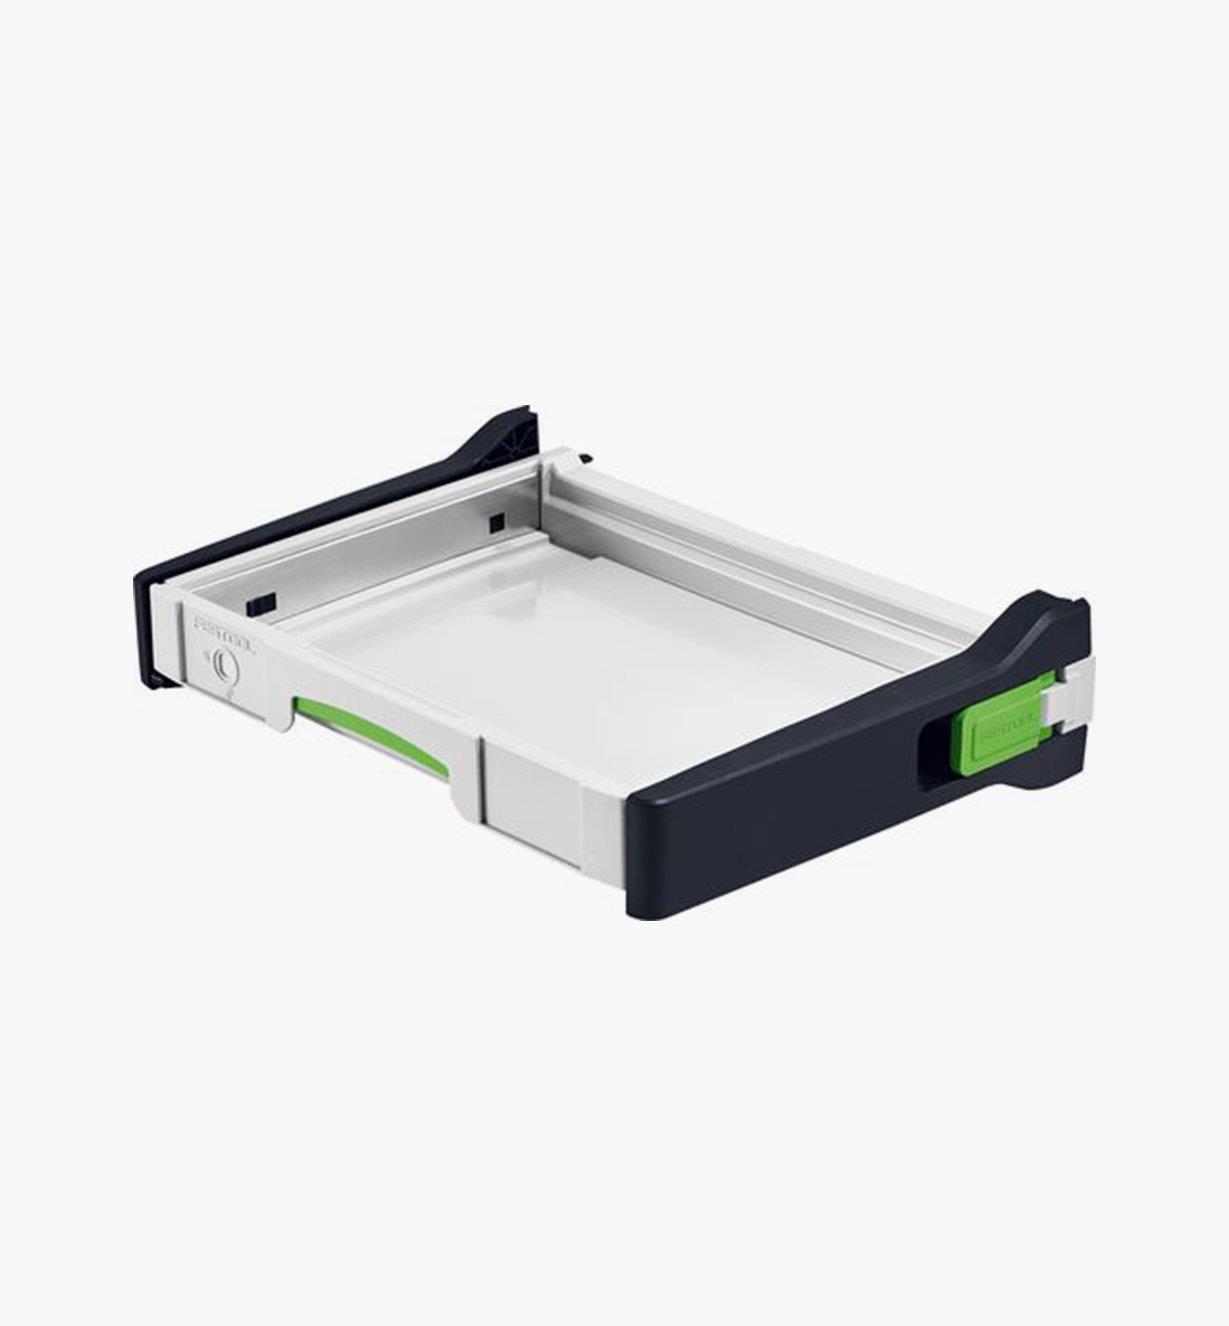 ZA203456 - Pull-Out Drawer, SYS-AZ, MW 1000